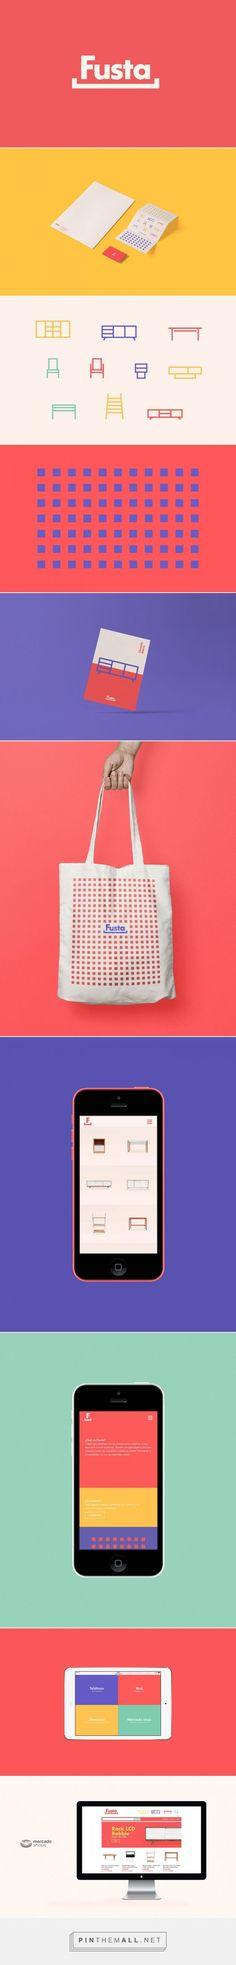 Fusta Branding on Behance | Fivestar Branding – Design and Branding Agency & Inspiration Gallery